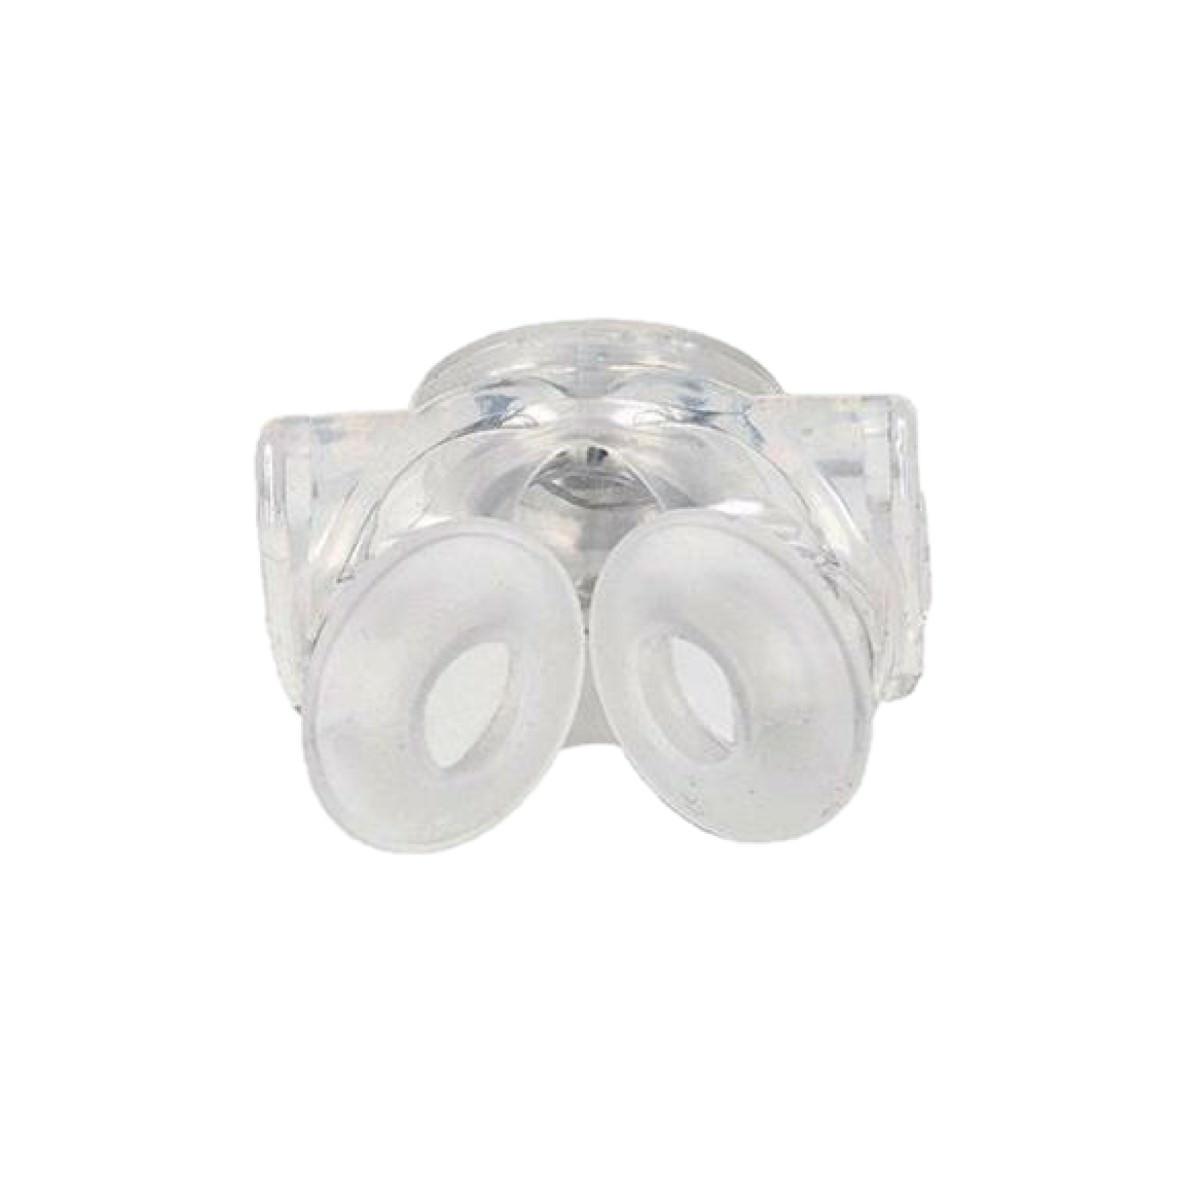 [Image: respcare-aloha-nasal-pillow-cpap-mask-wi...sizew=1200]